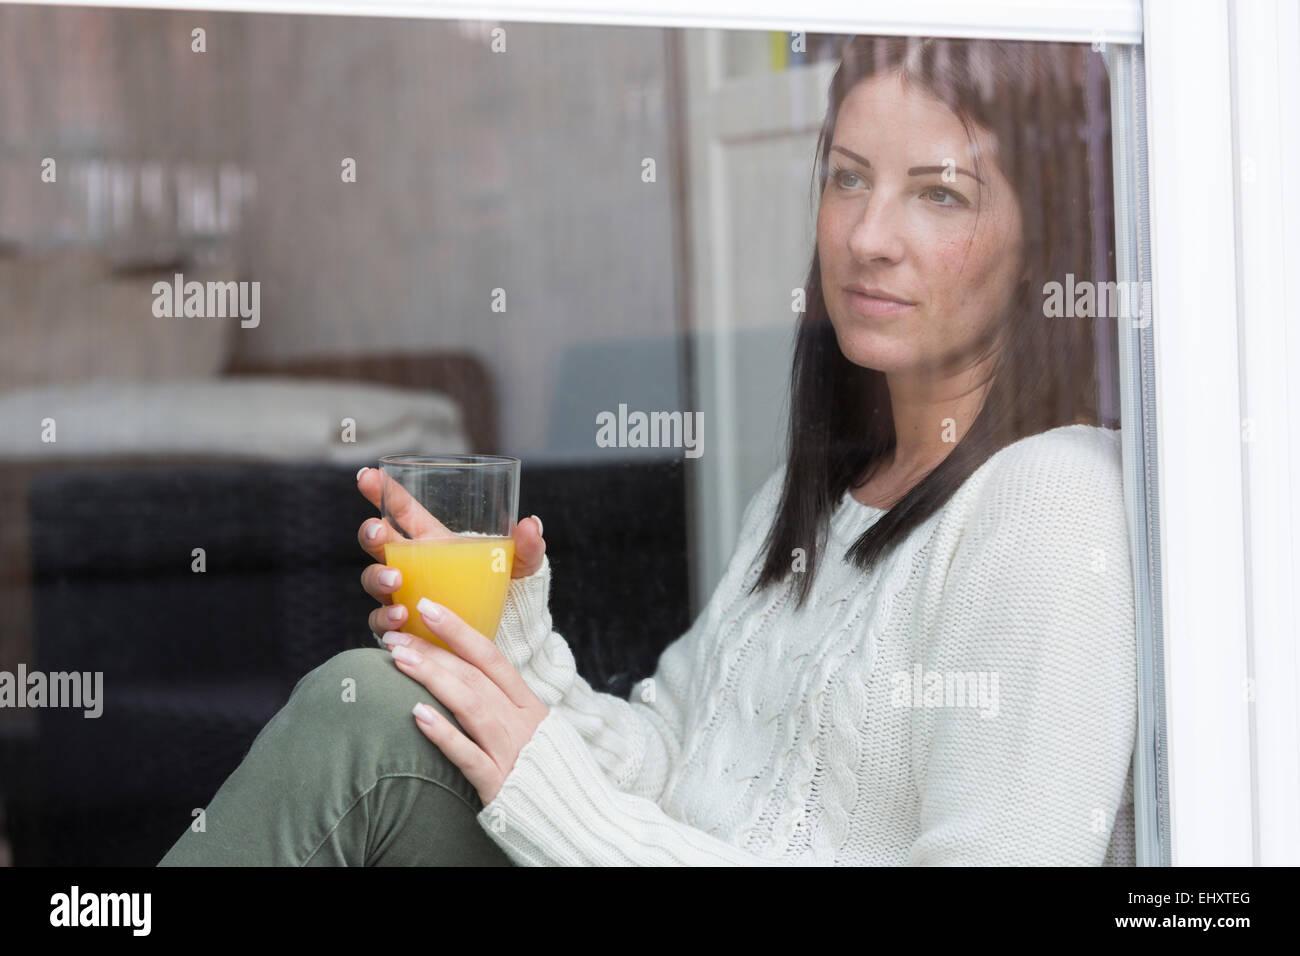 Woman with glass of orange juice looking through window - Stock Image